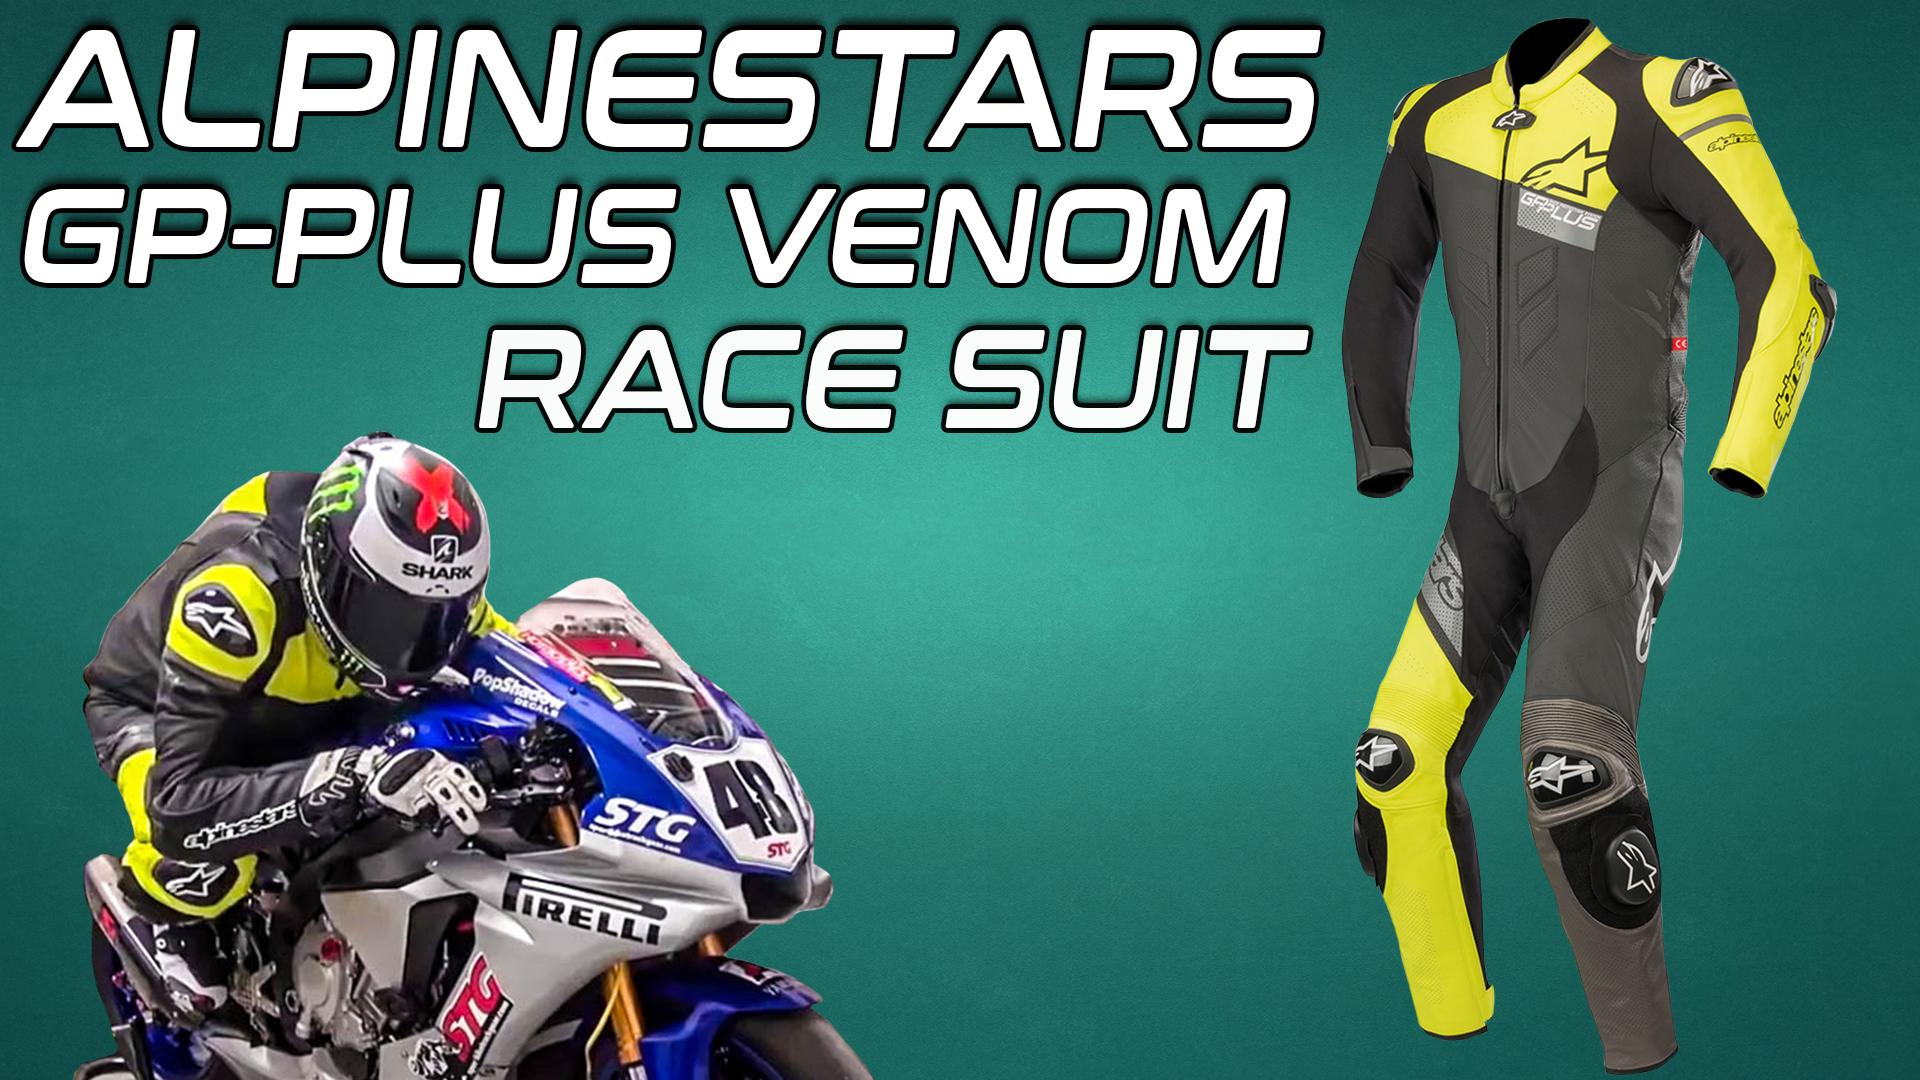 Alpinestars GP Plus Venom Race Suit